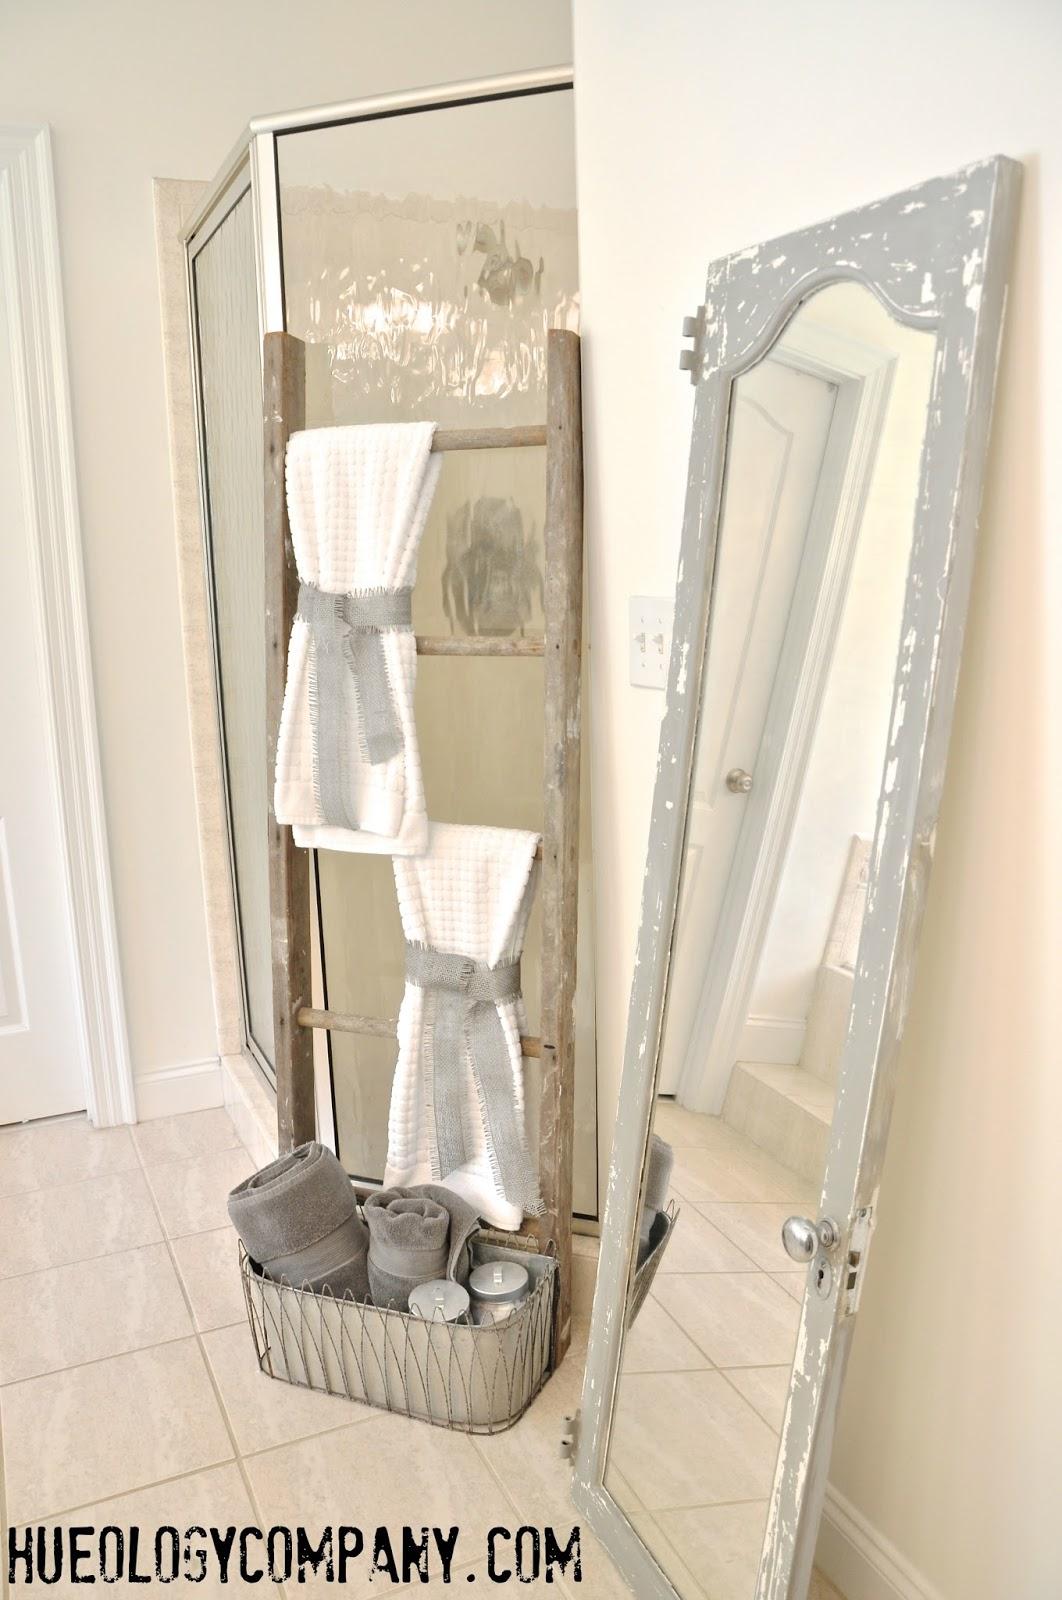 painting bathroom cabinets | Hueology Studio